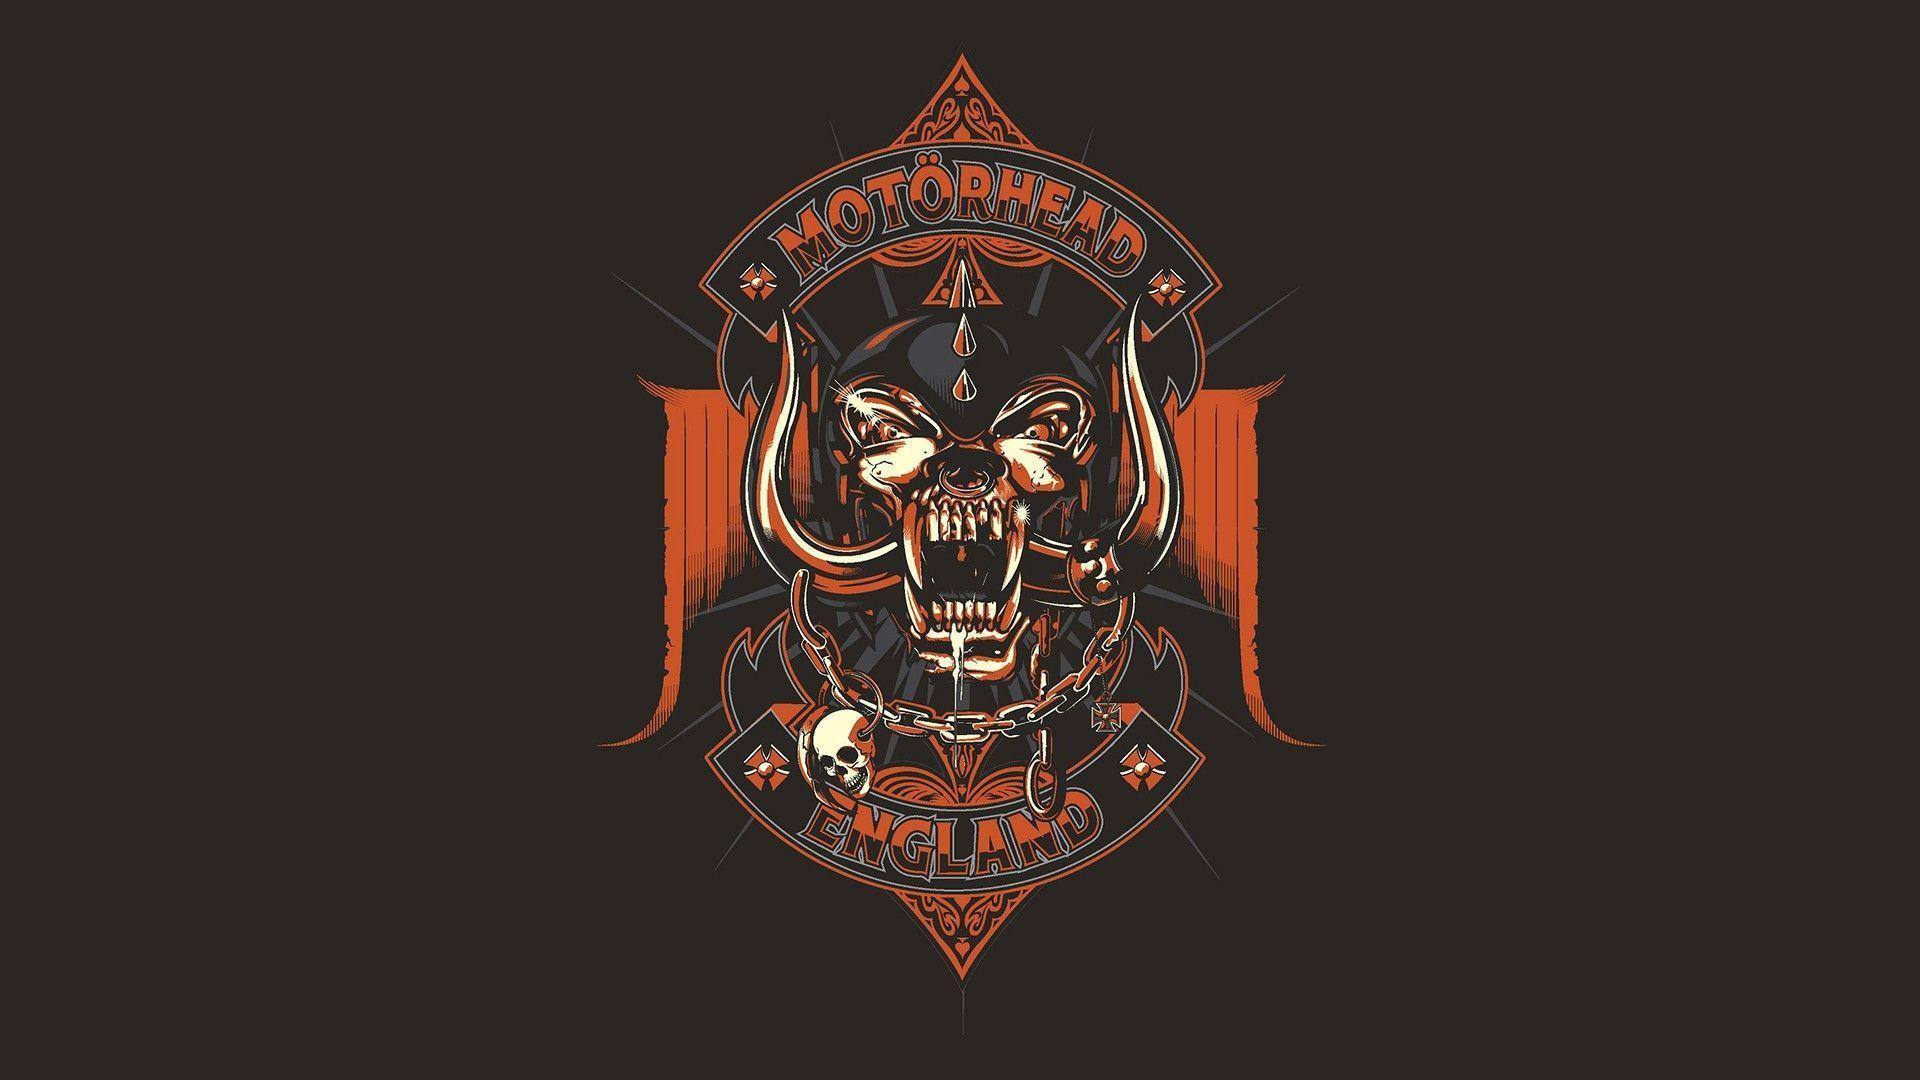 Motörhead Wallpapers - Wallpaper Cave